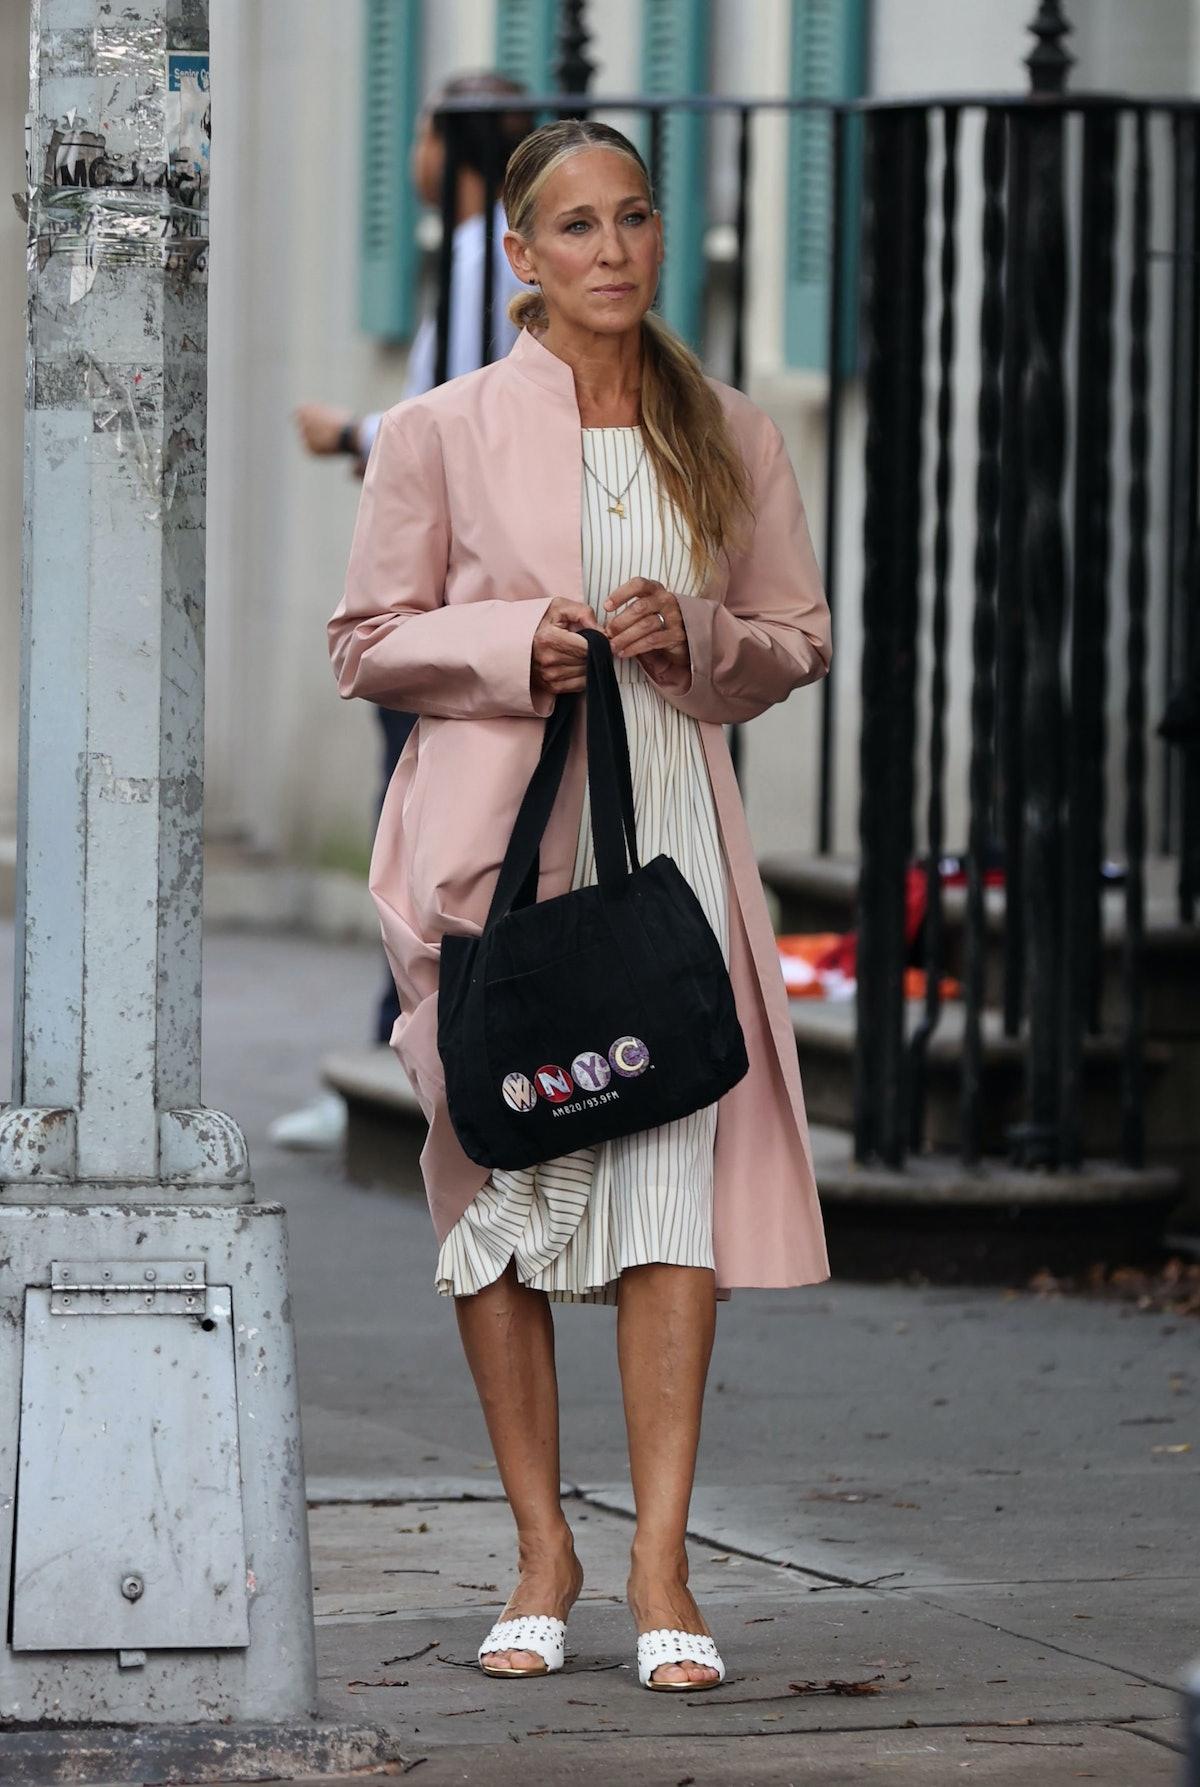 Carrie Bradshaw with WNYC tote bag.